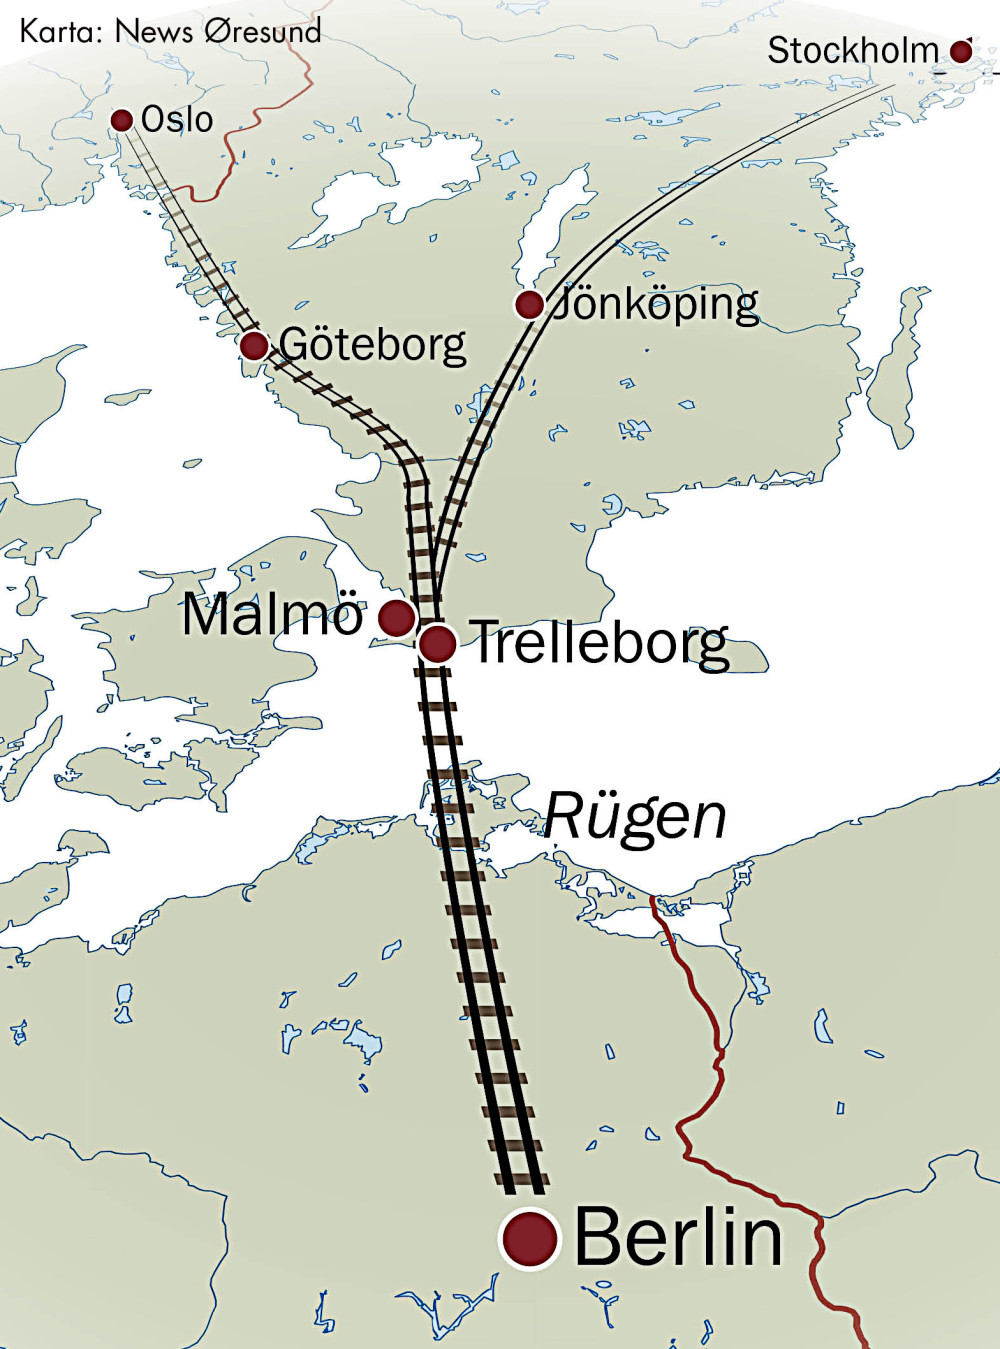 Karta: News Øresund